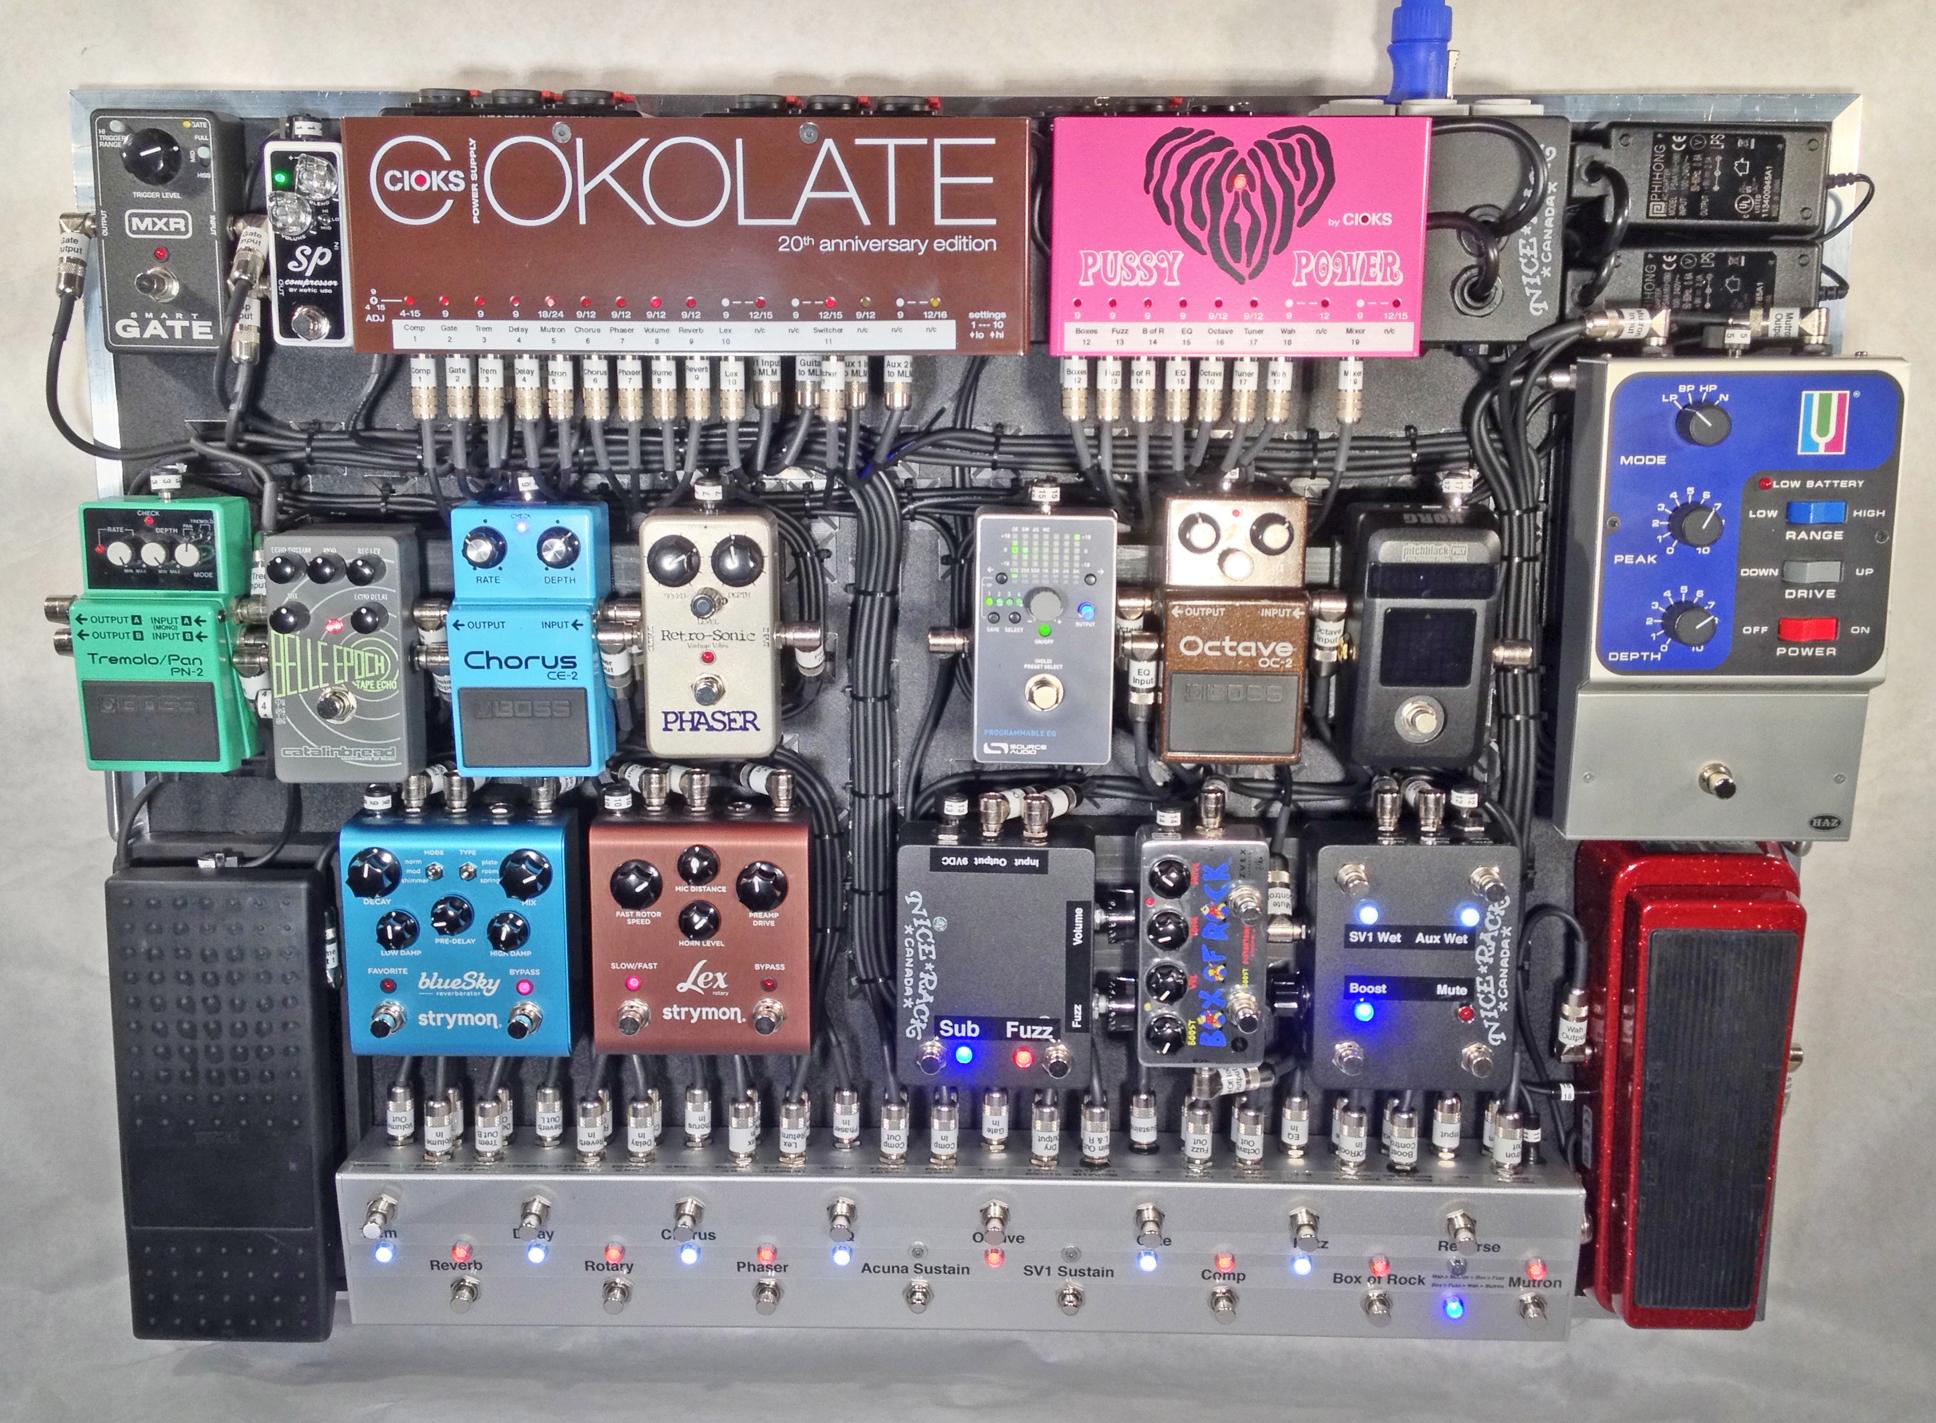 Chocolate_Pussy_Power_Mojo_Music_Keyboard_Rig_01.JPG